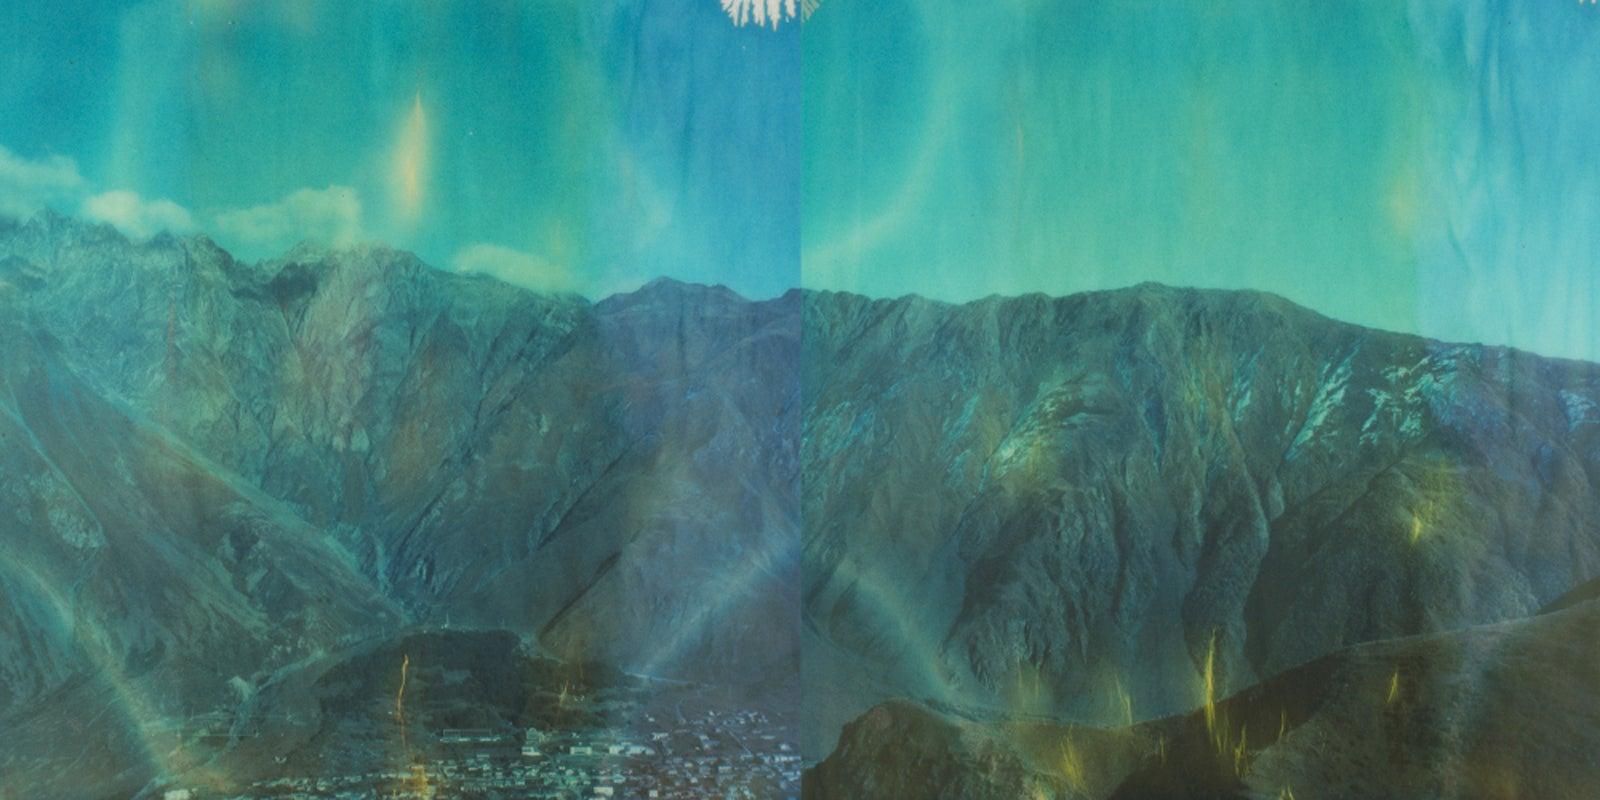 And I Must Go - Contemporary, Polaroid, 21st Century, Landscape